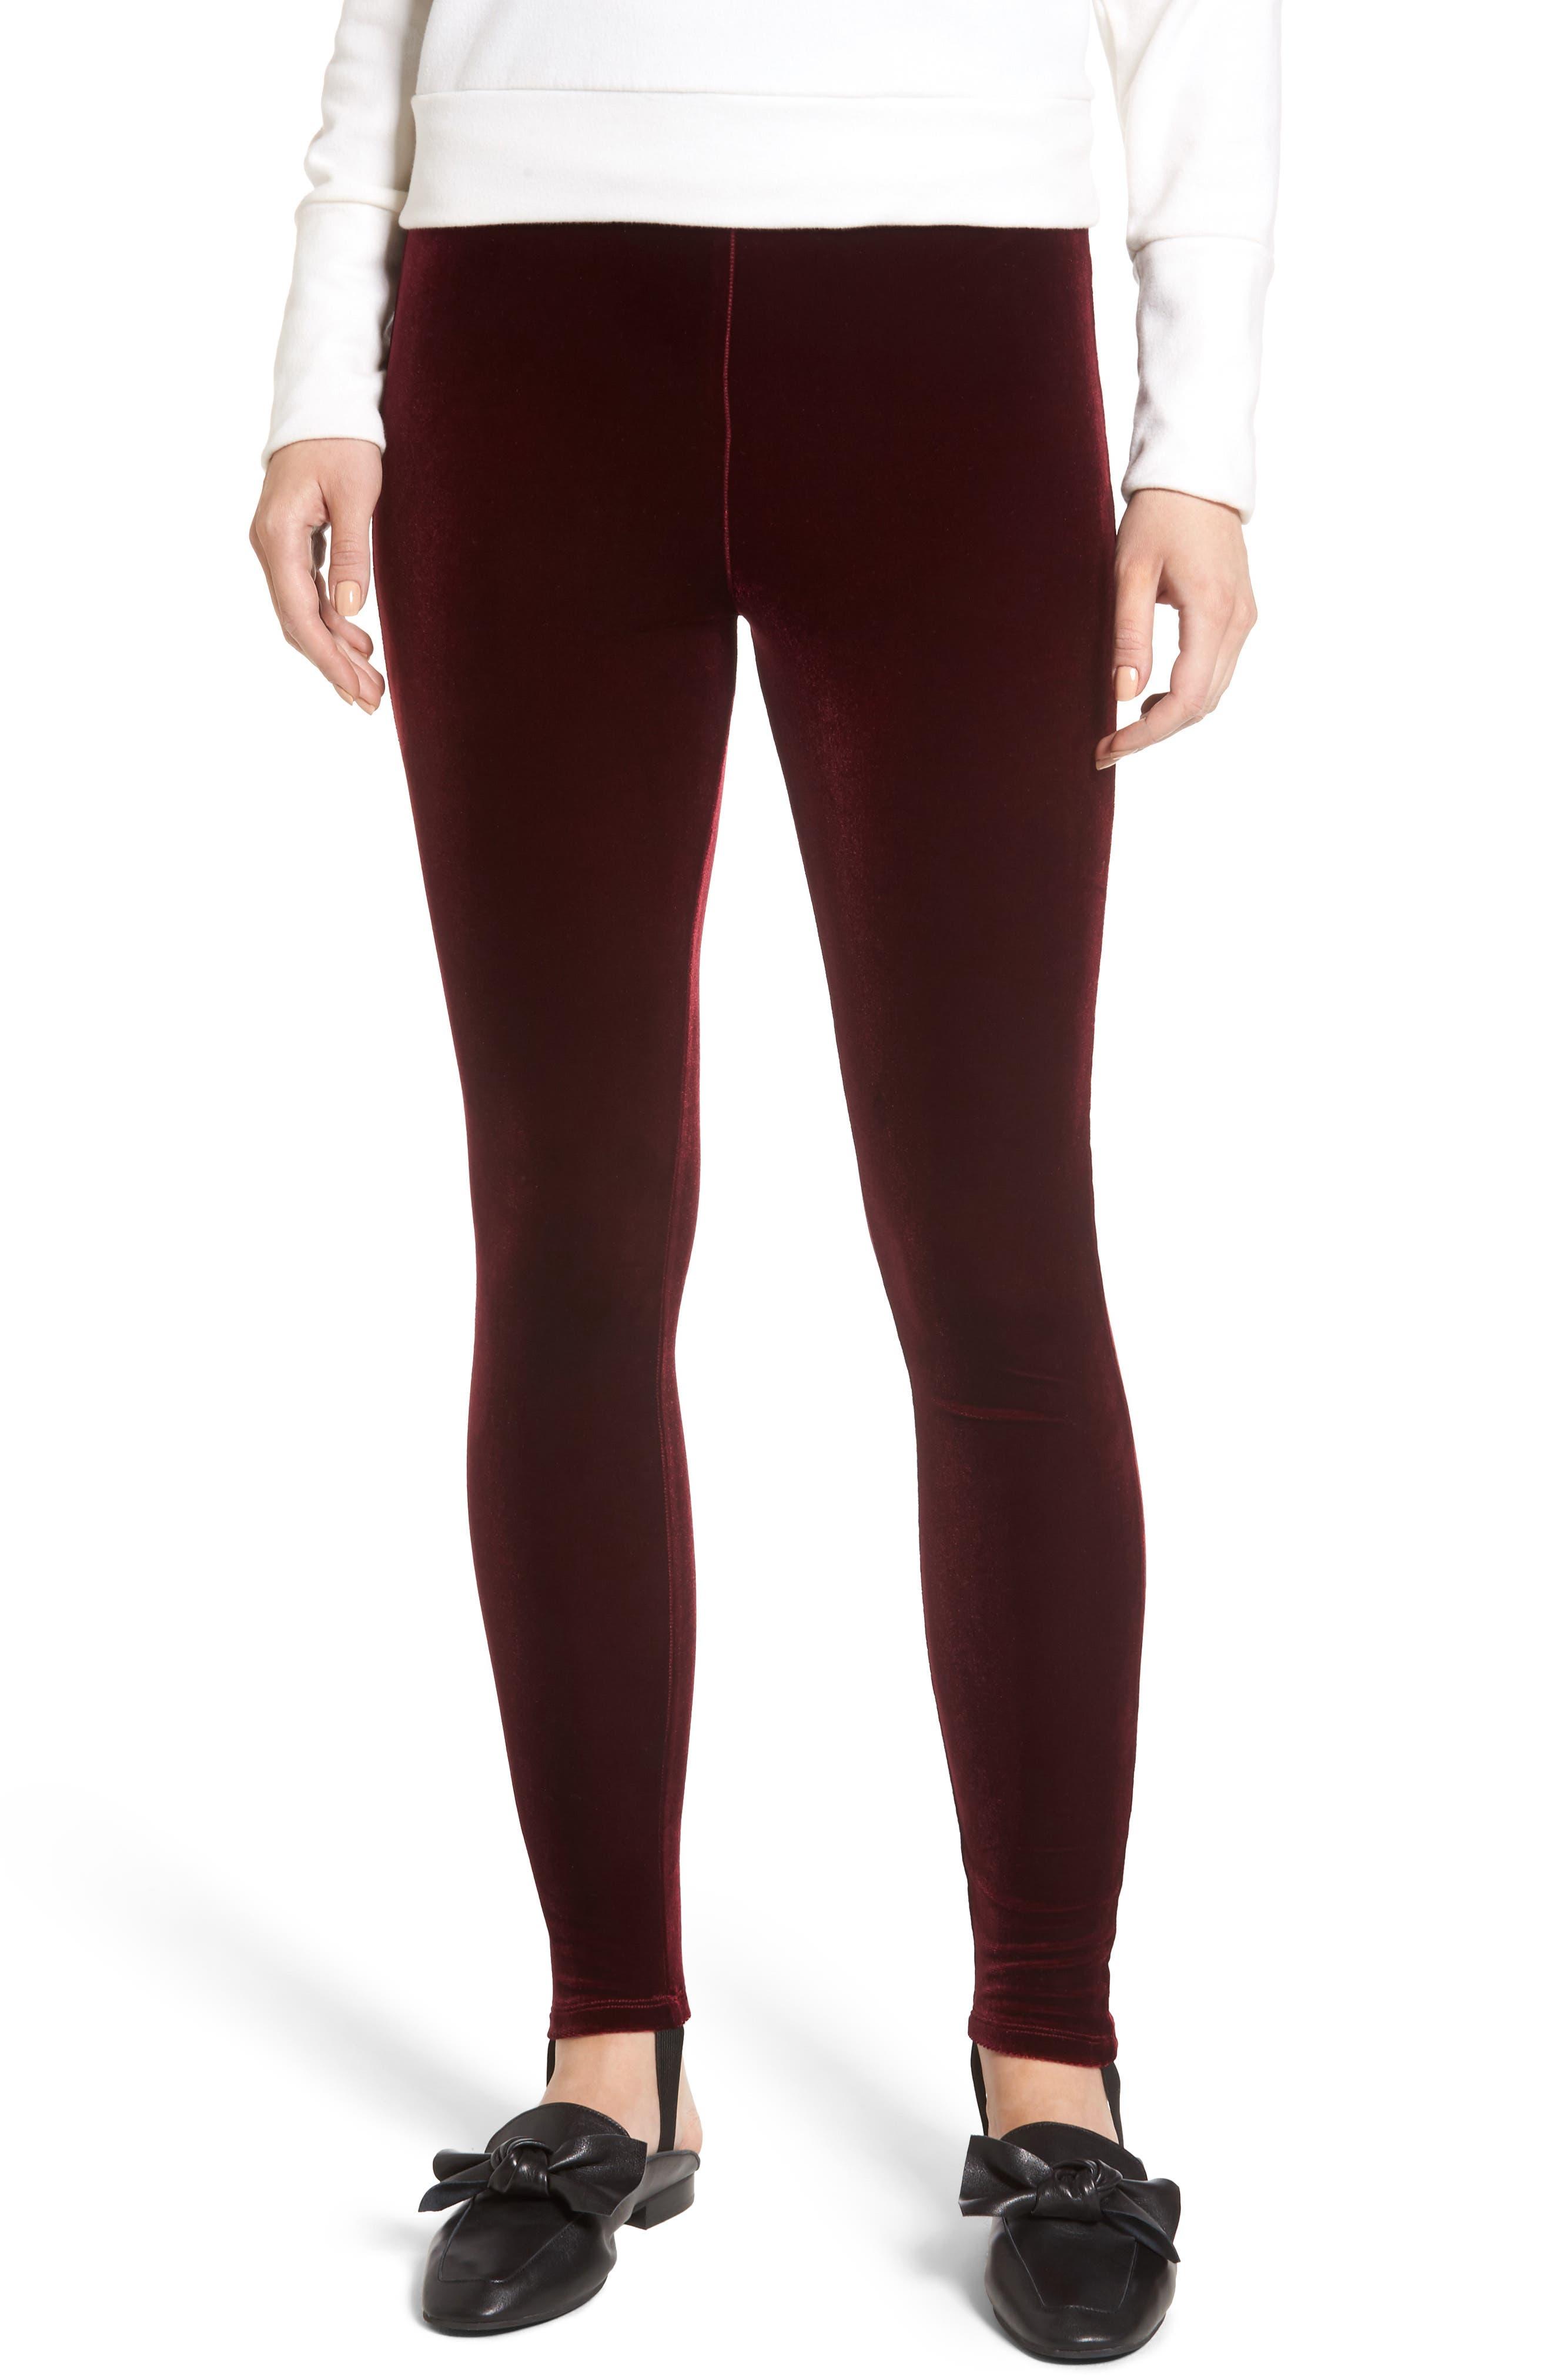 High Waist Velour Stirrup Pants,                         Main,                         color, Red Tannin